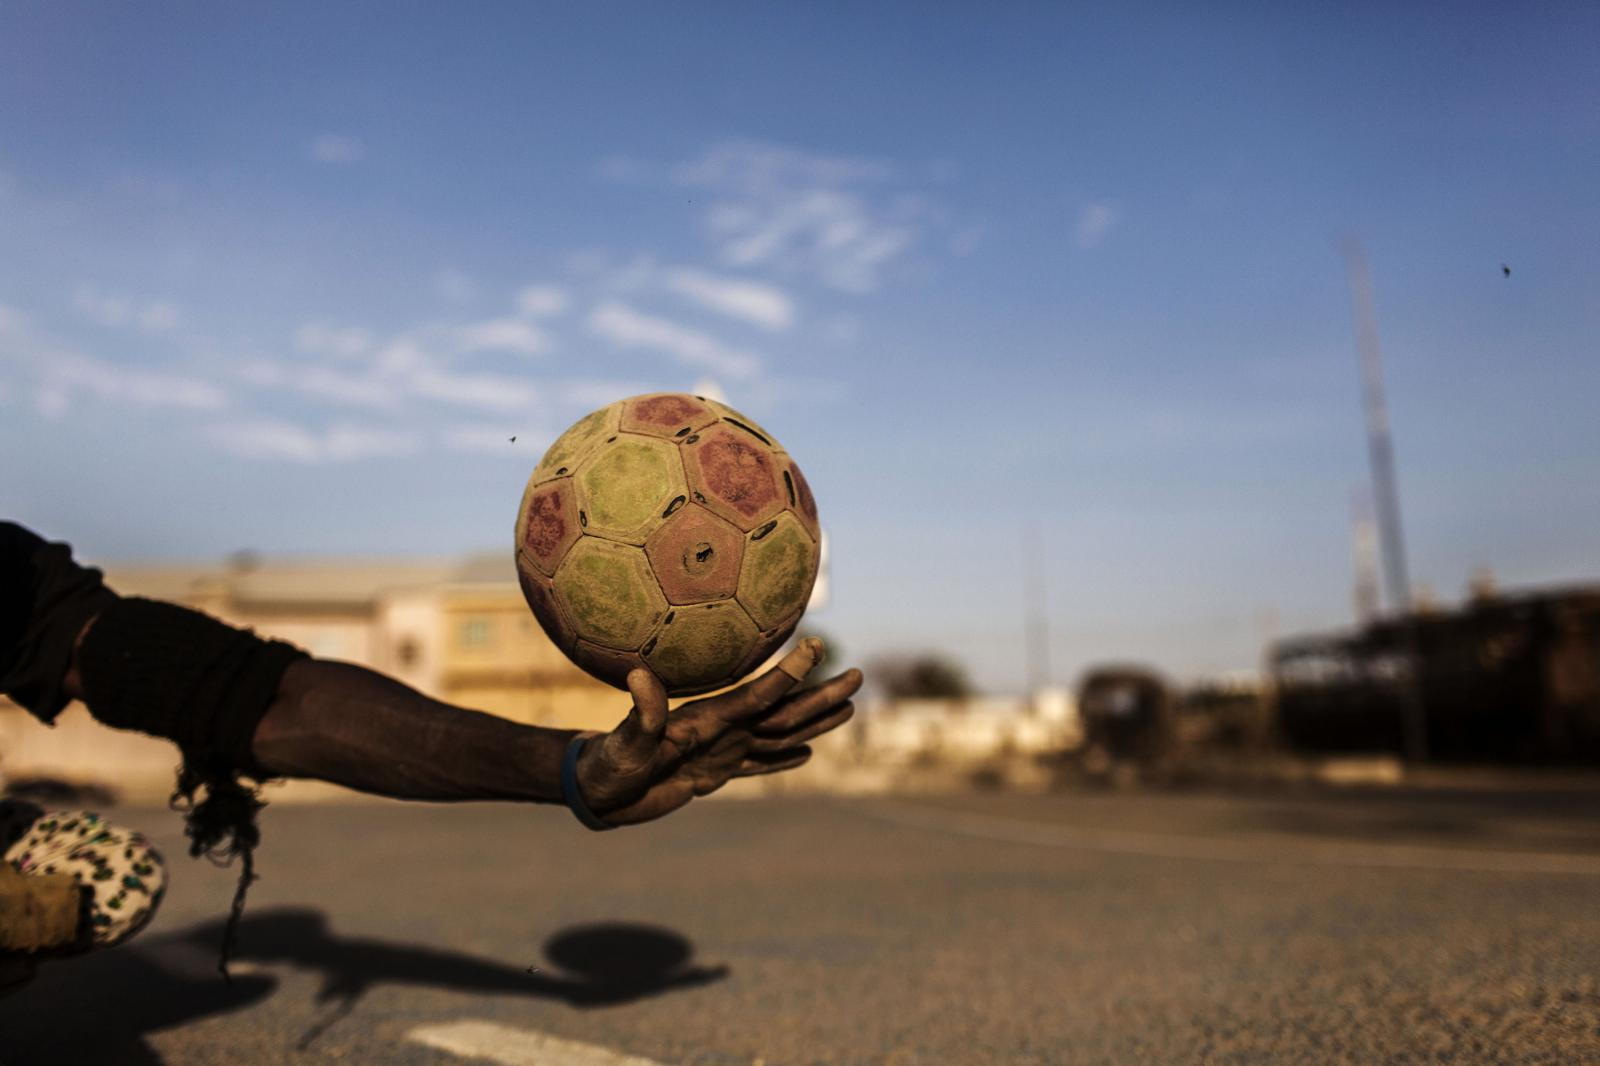 Photography image - Loading parasoccer-Nigeria-001.jpg